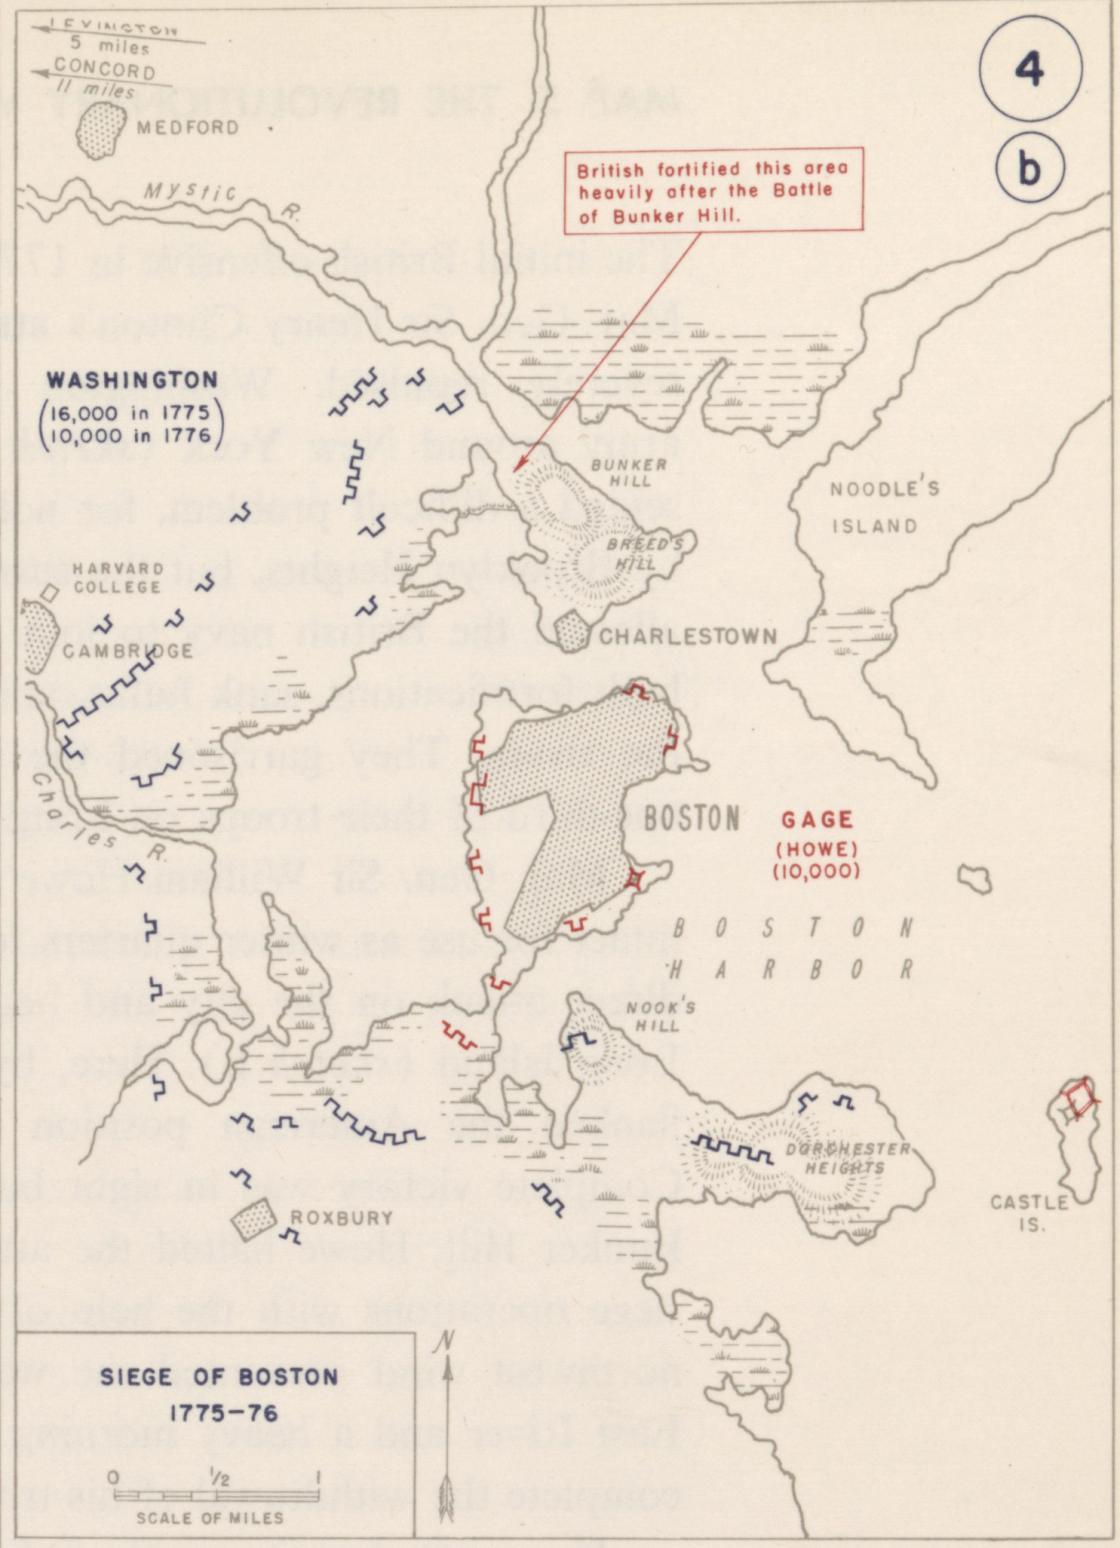 Siege of Boston 1775-76